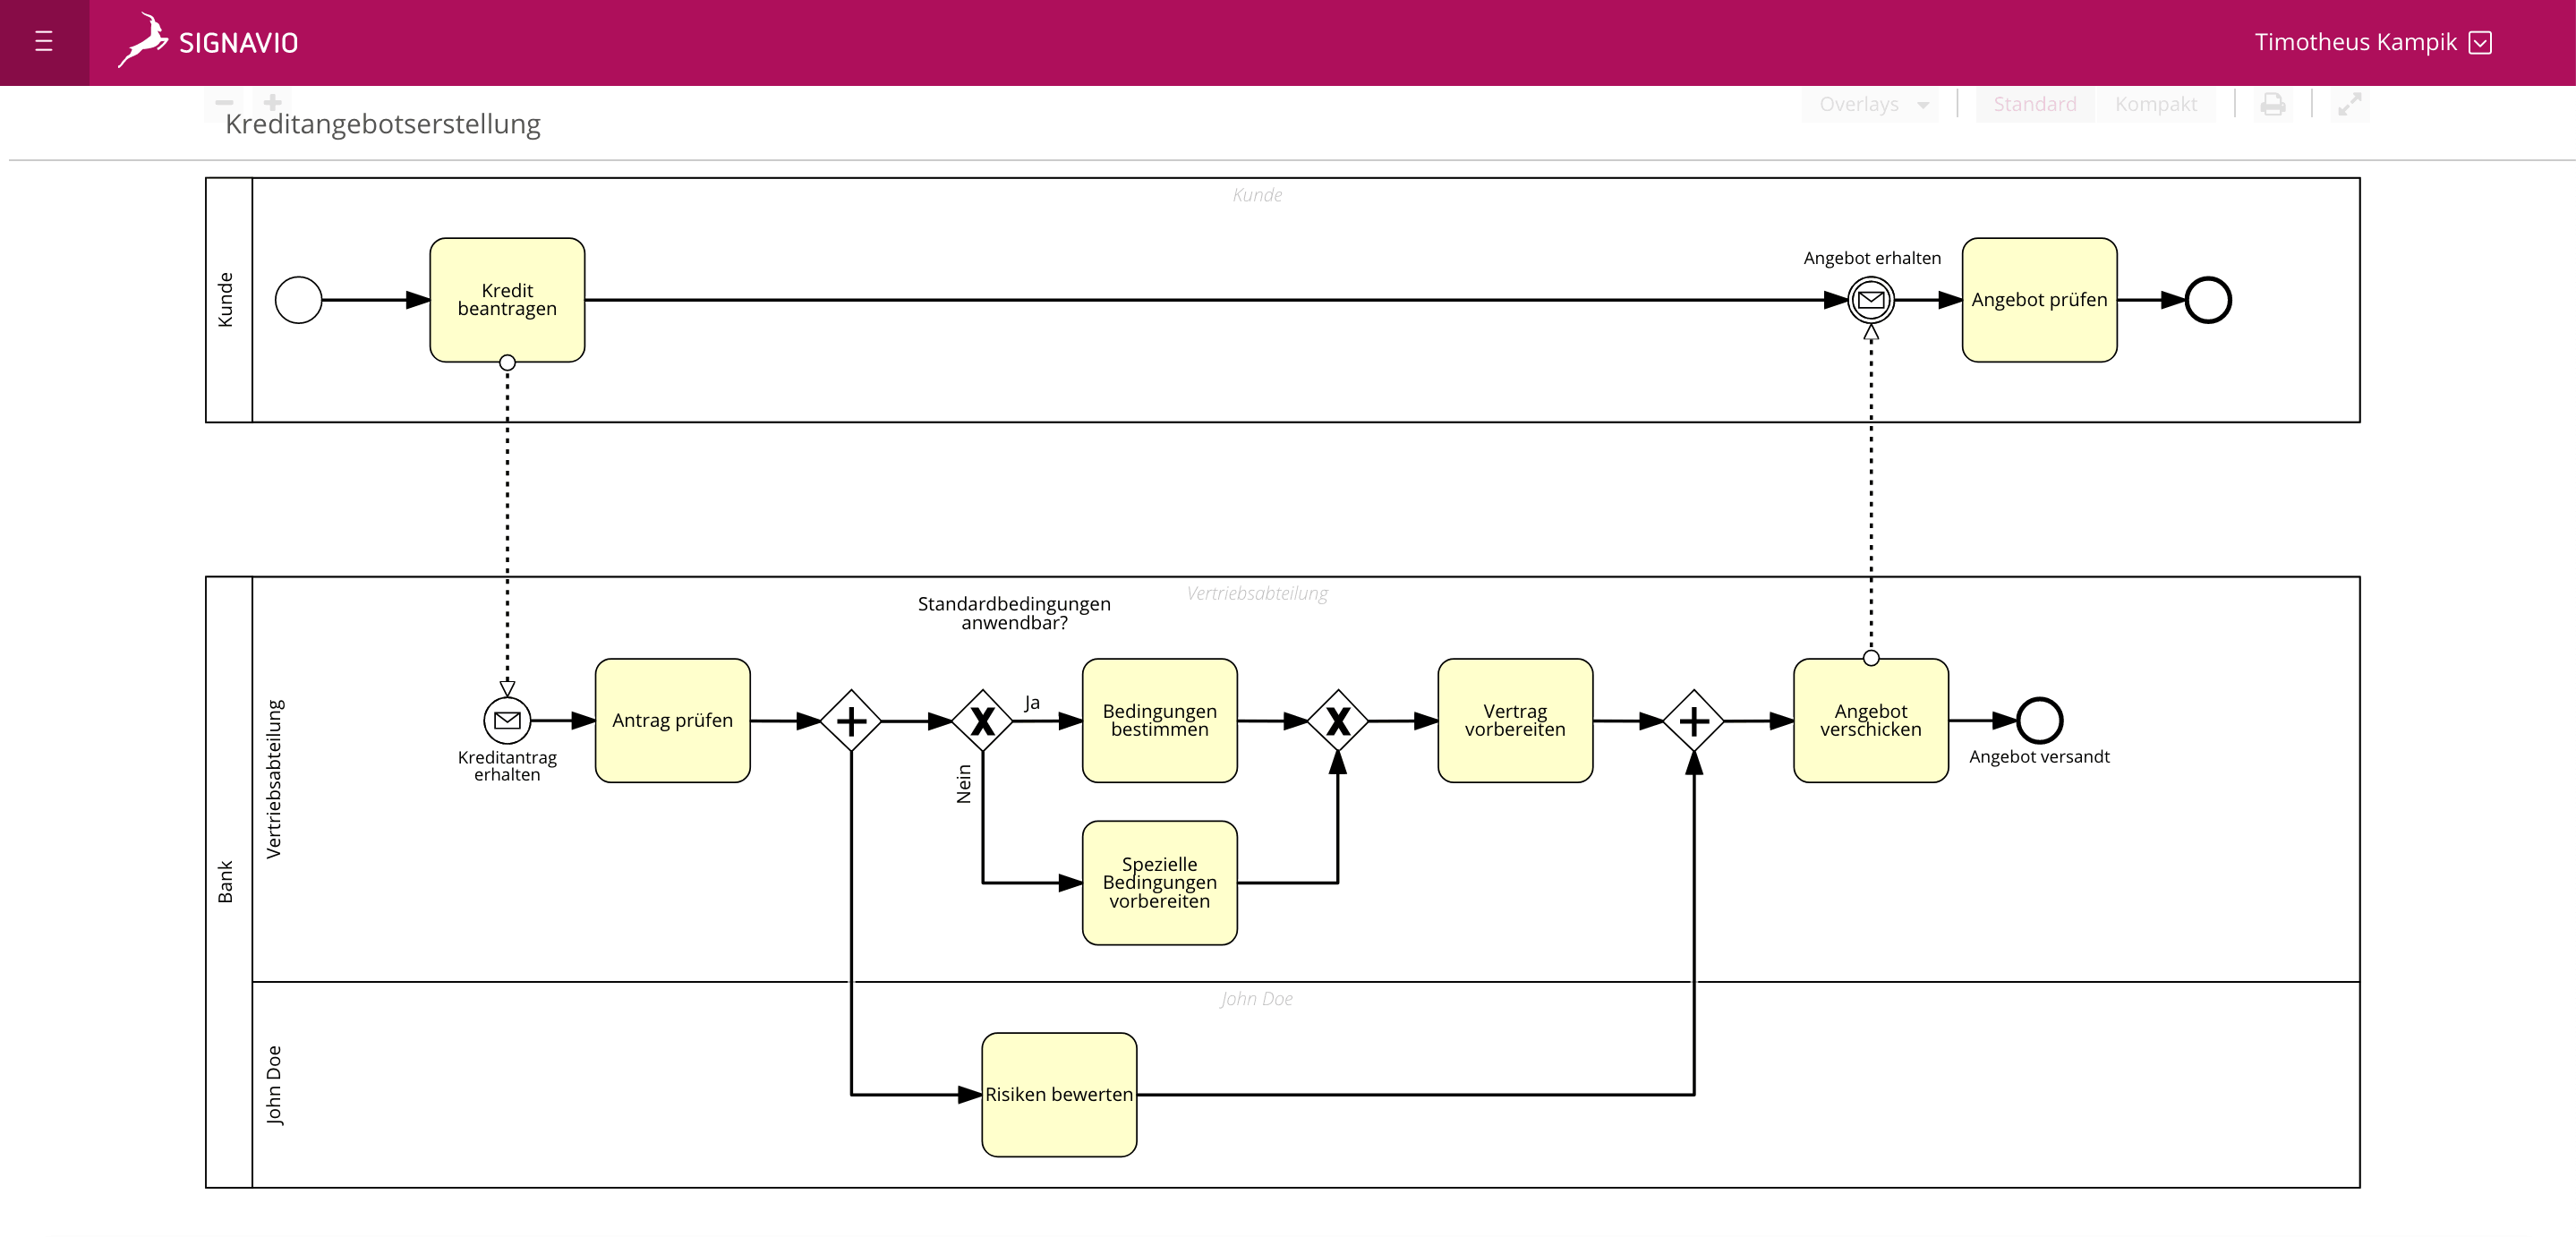 Bpmn Basics Pools Und Lanes Verstehen Signavio